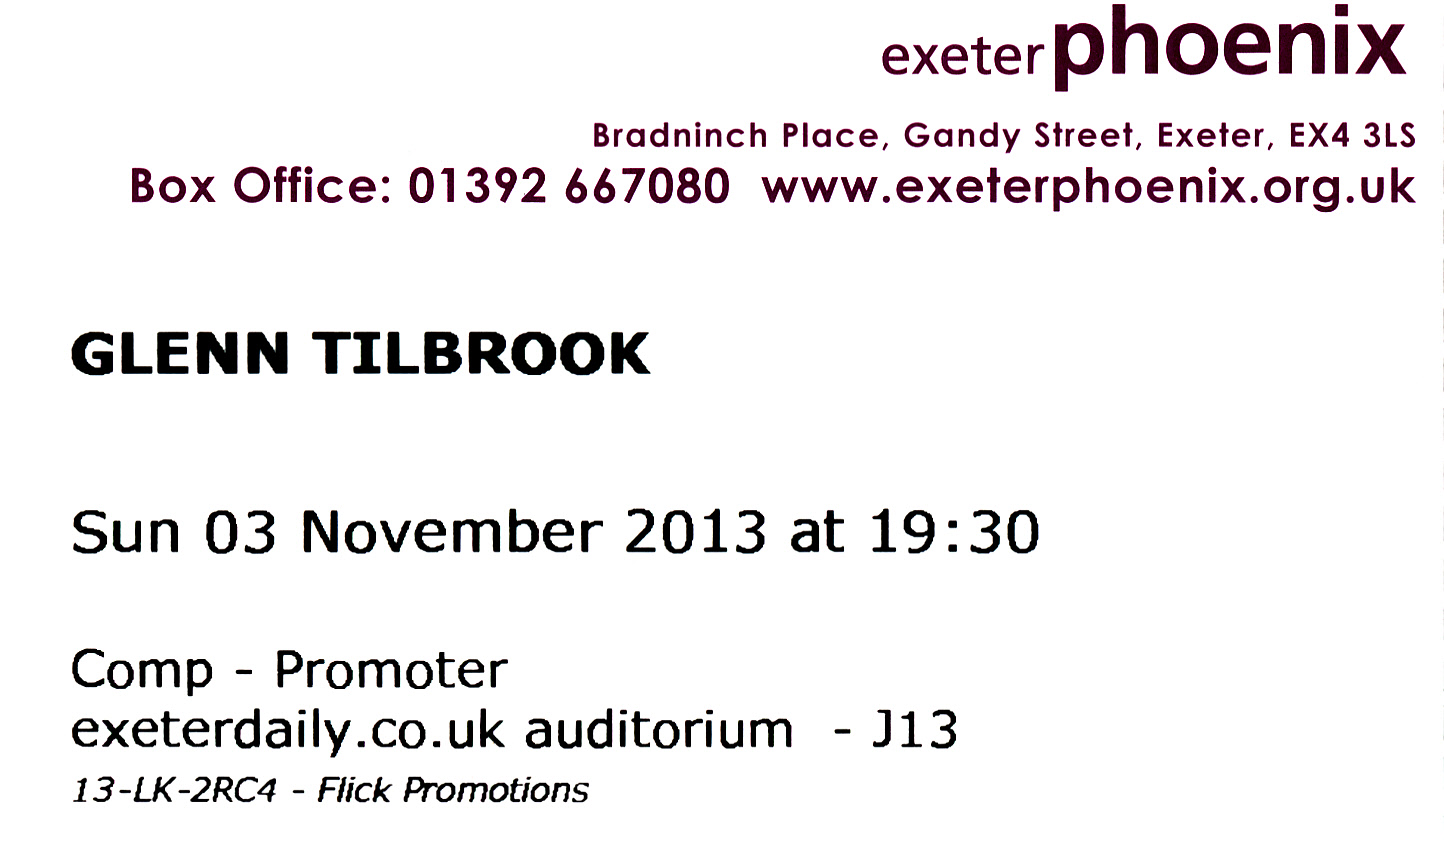 2013-11-03 ticket